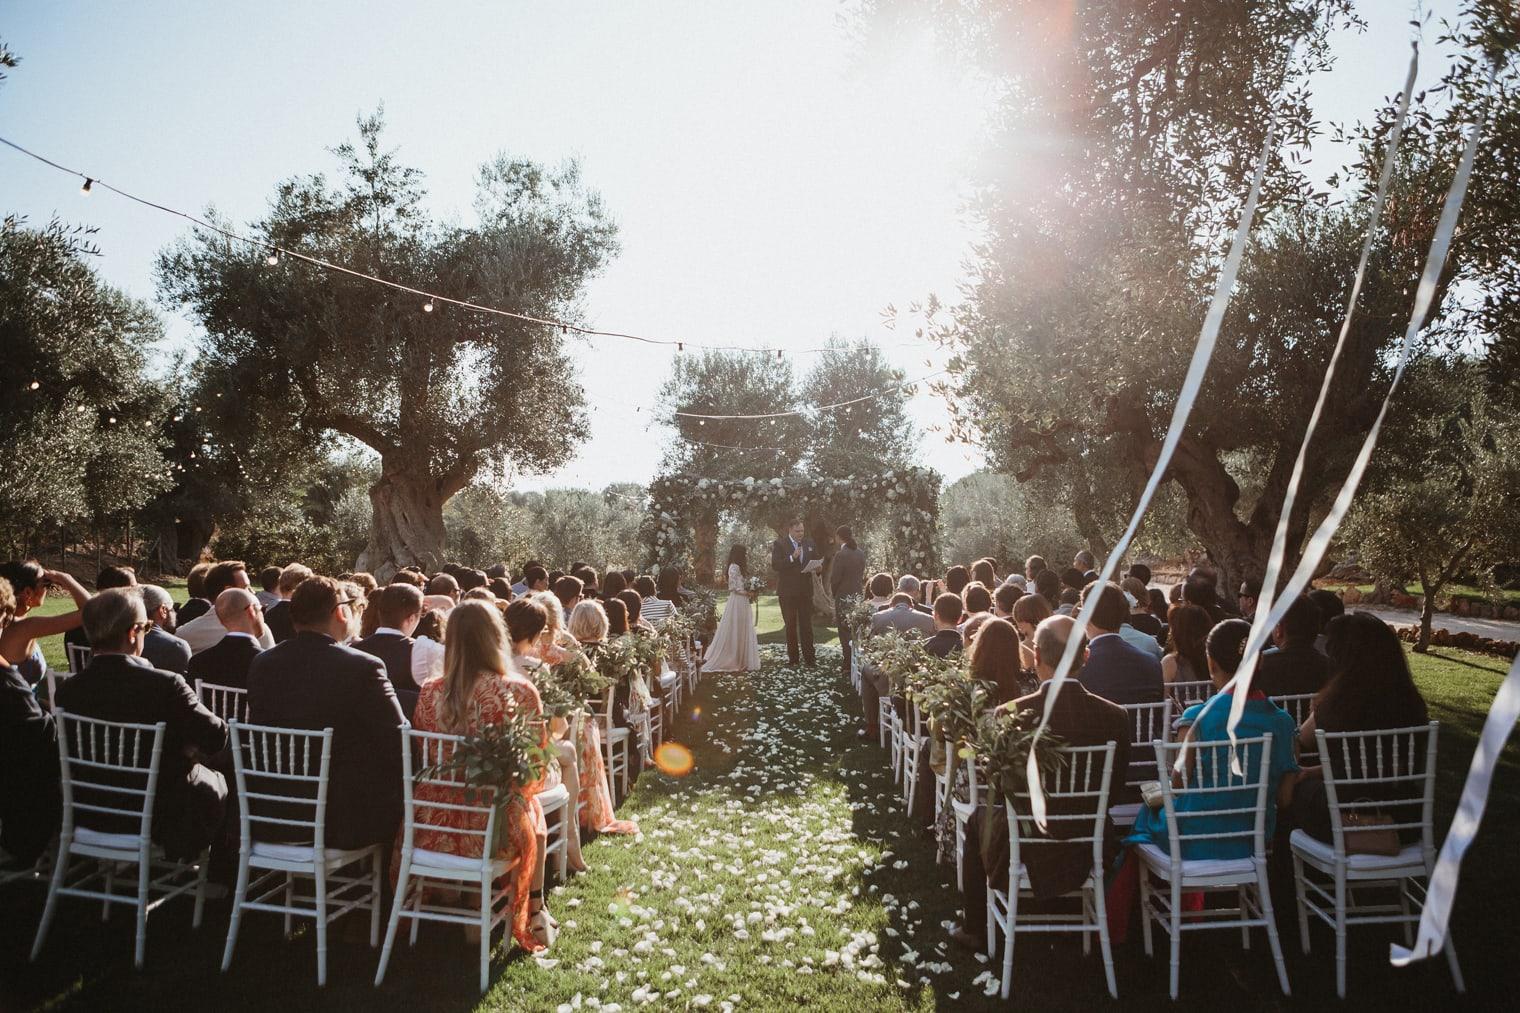 Masseria Torre Coccaro wedding ceremony in Italy